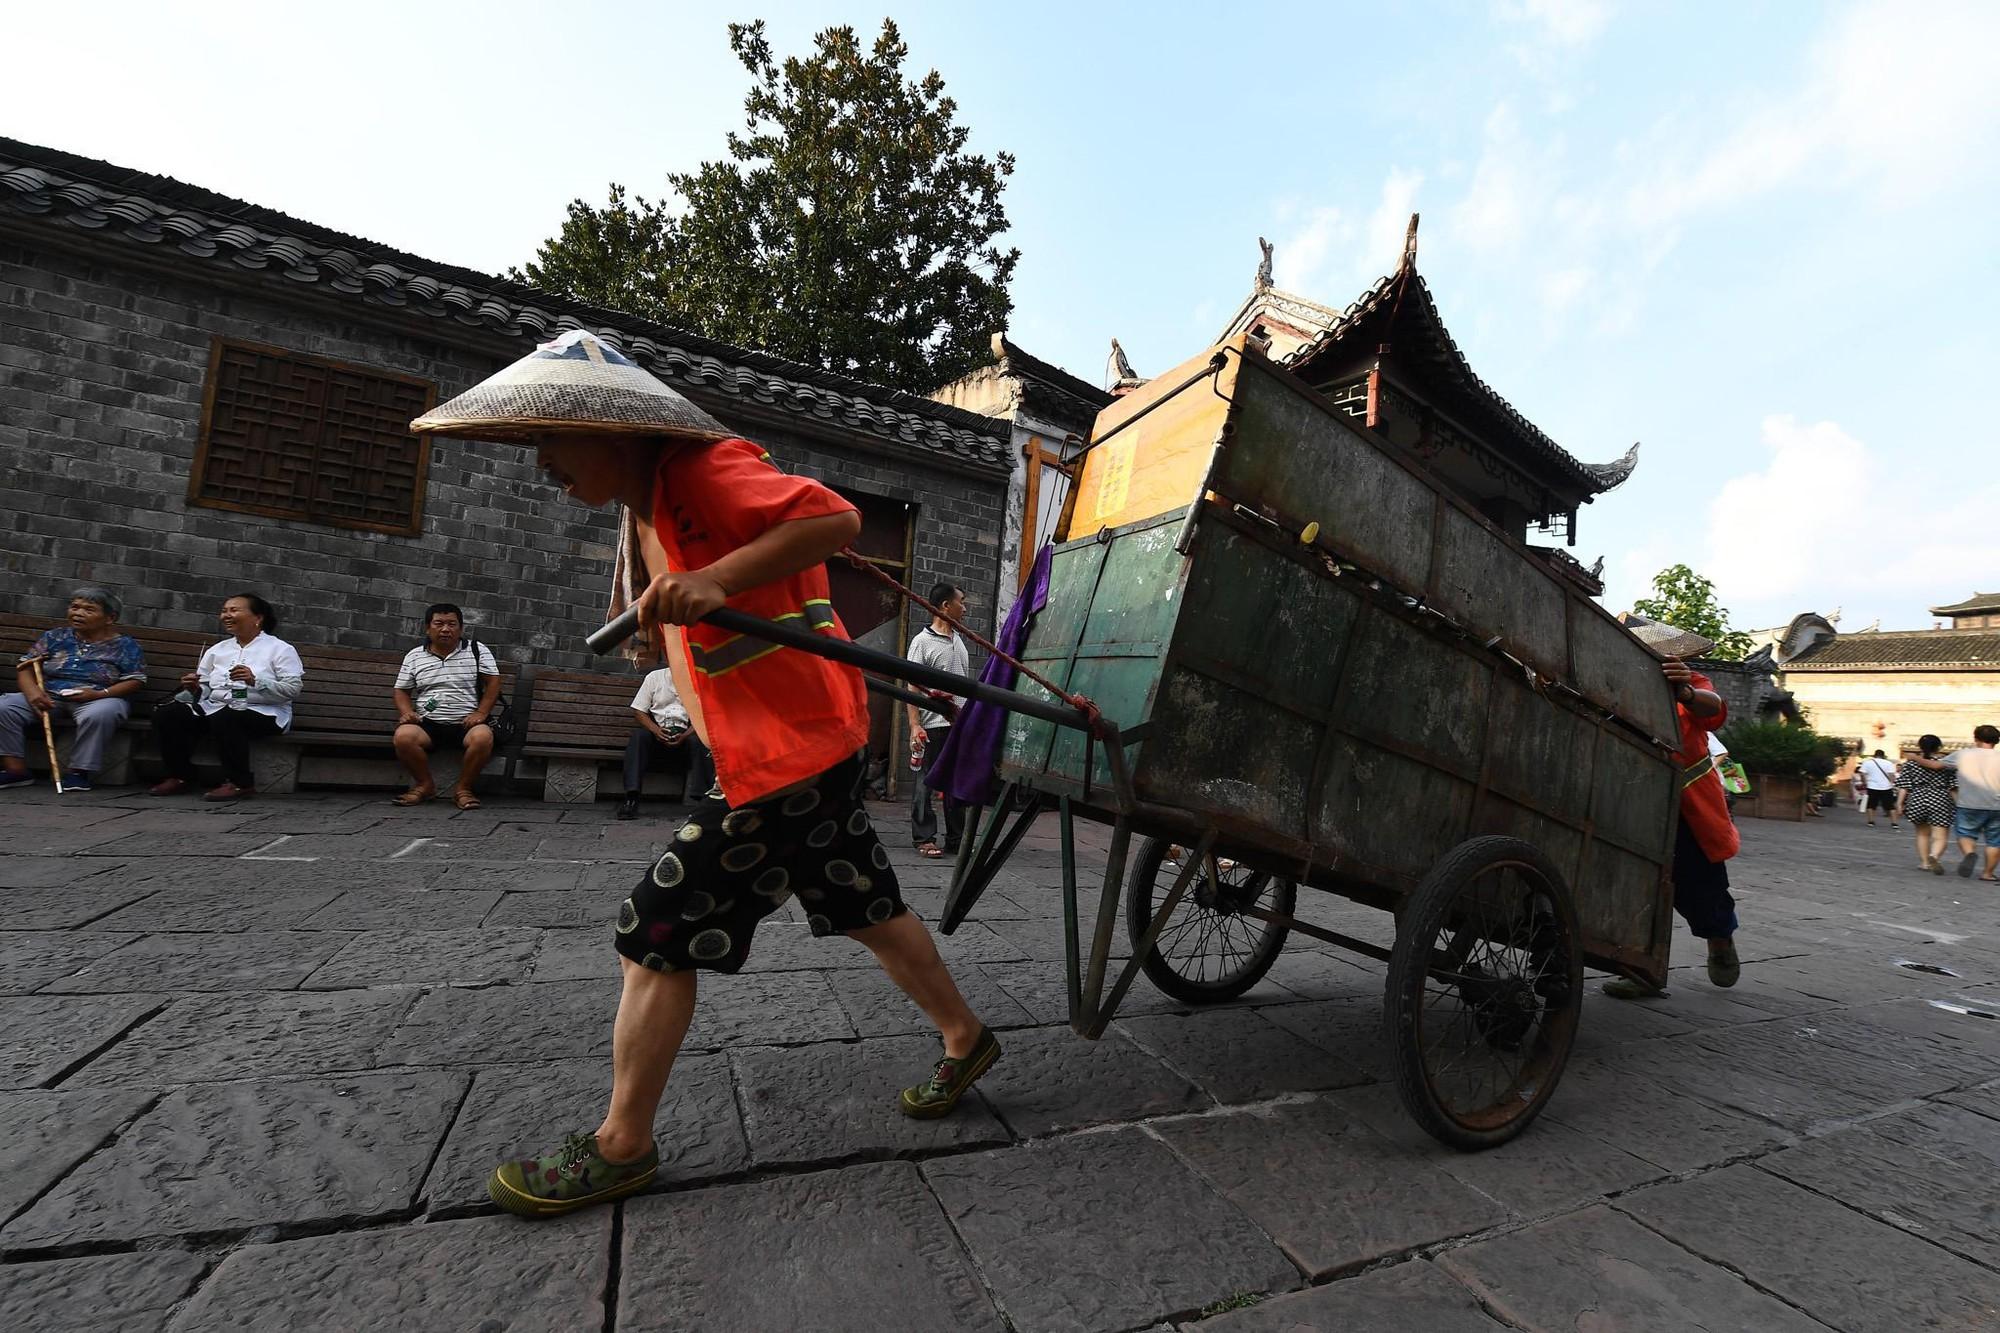 Phuong Hoang co tran va bi mat thu hut khach du lich quanh nam hinh anh 10